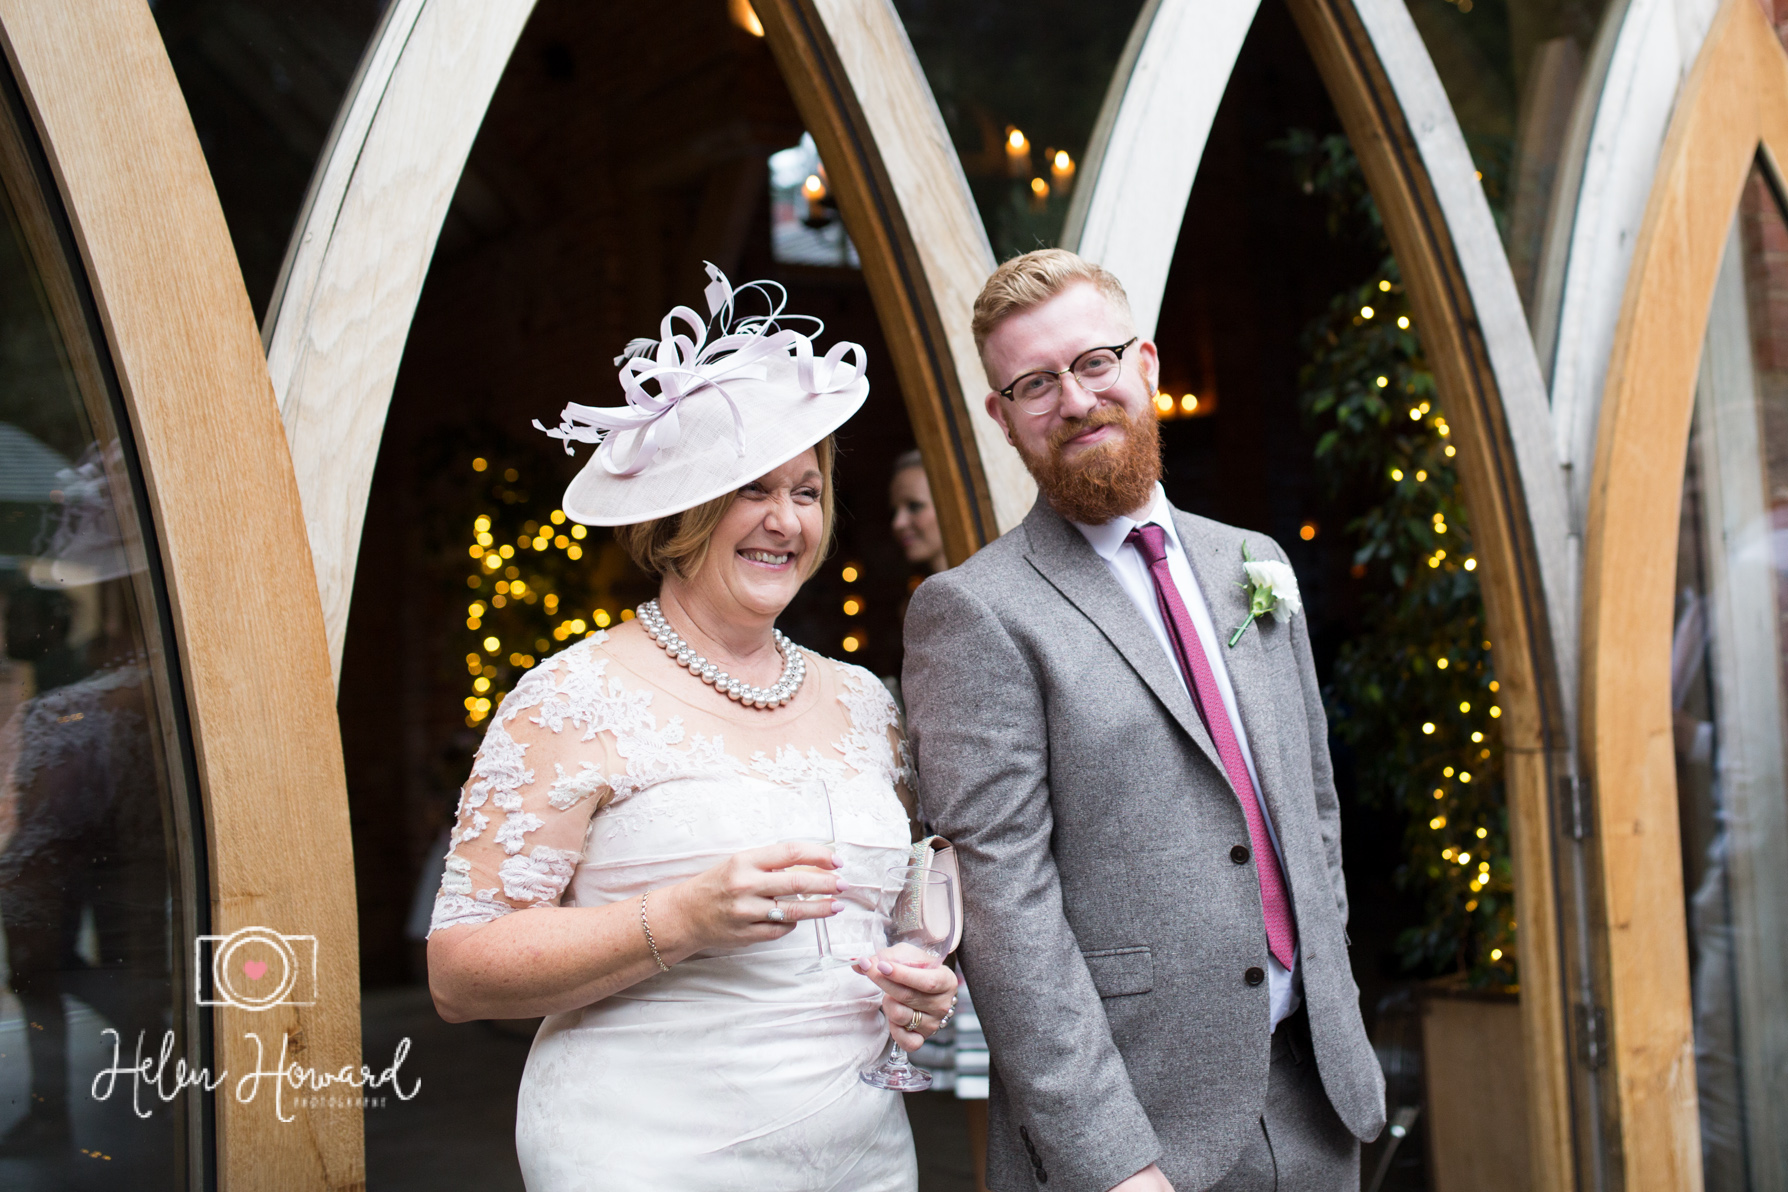 Shustoke Farm Barns Wedding Photography by Helen Howard-35.jpg